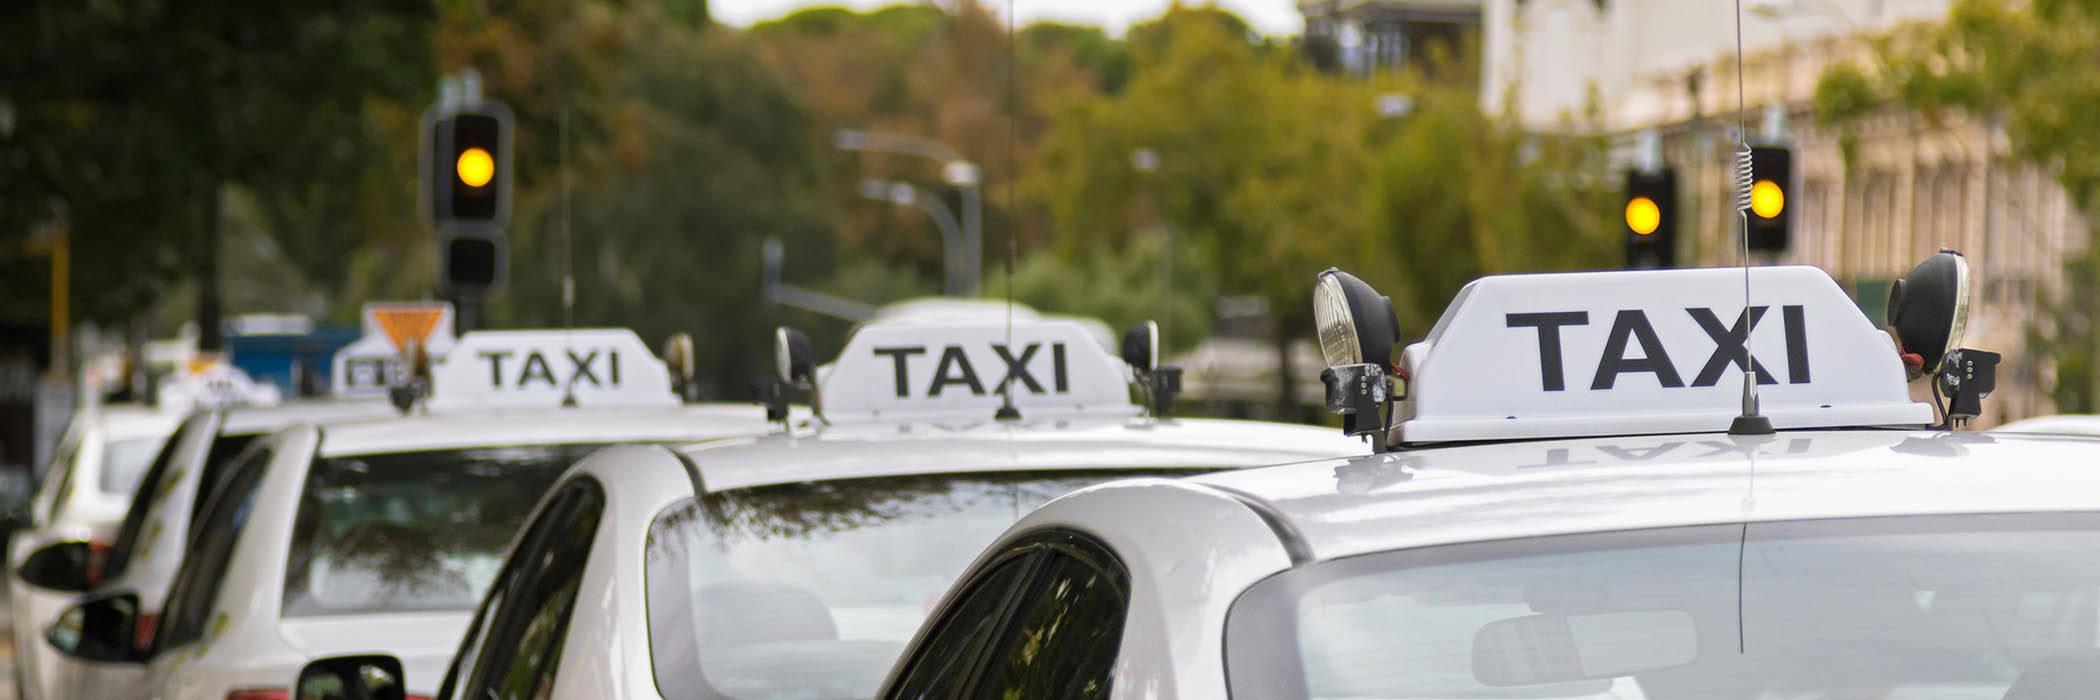 21sep taxi company fine hero